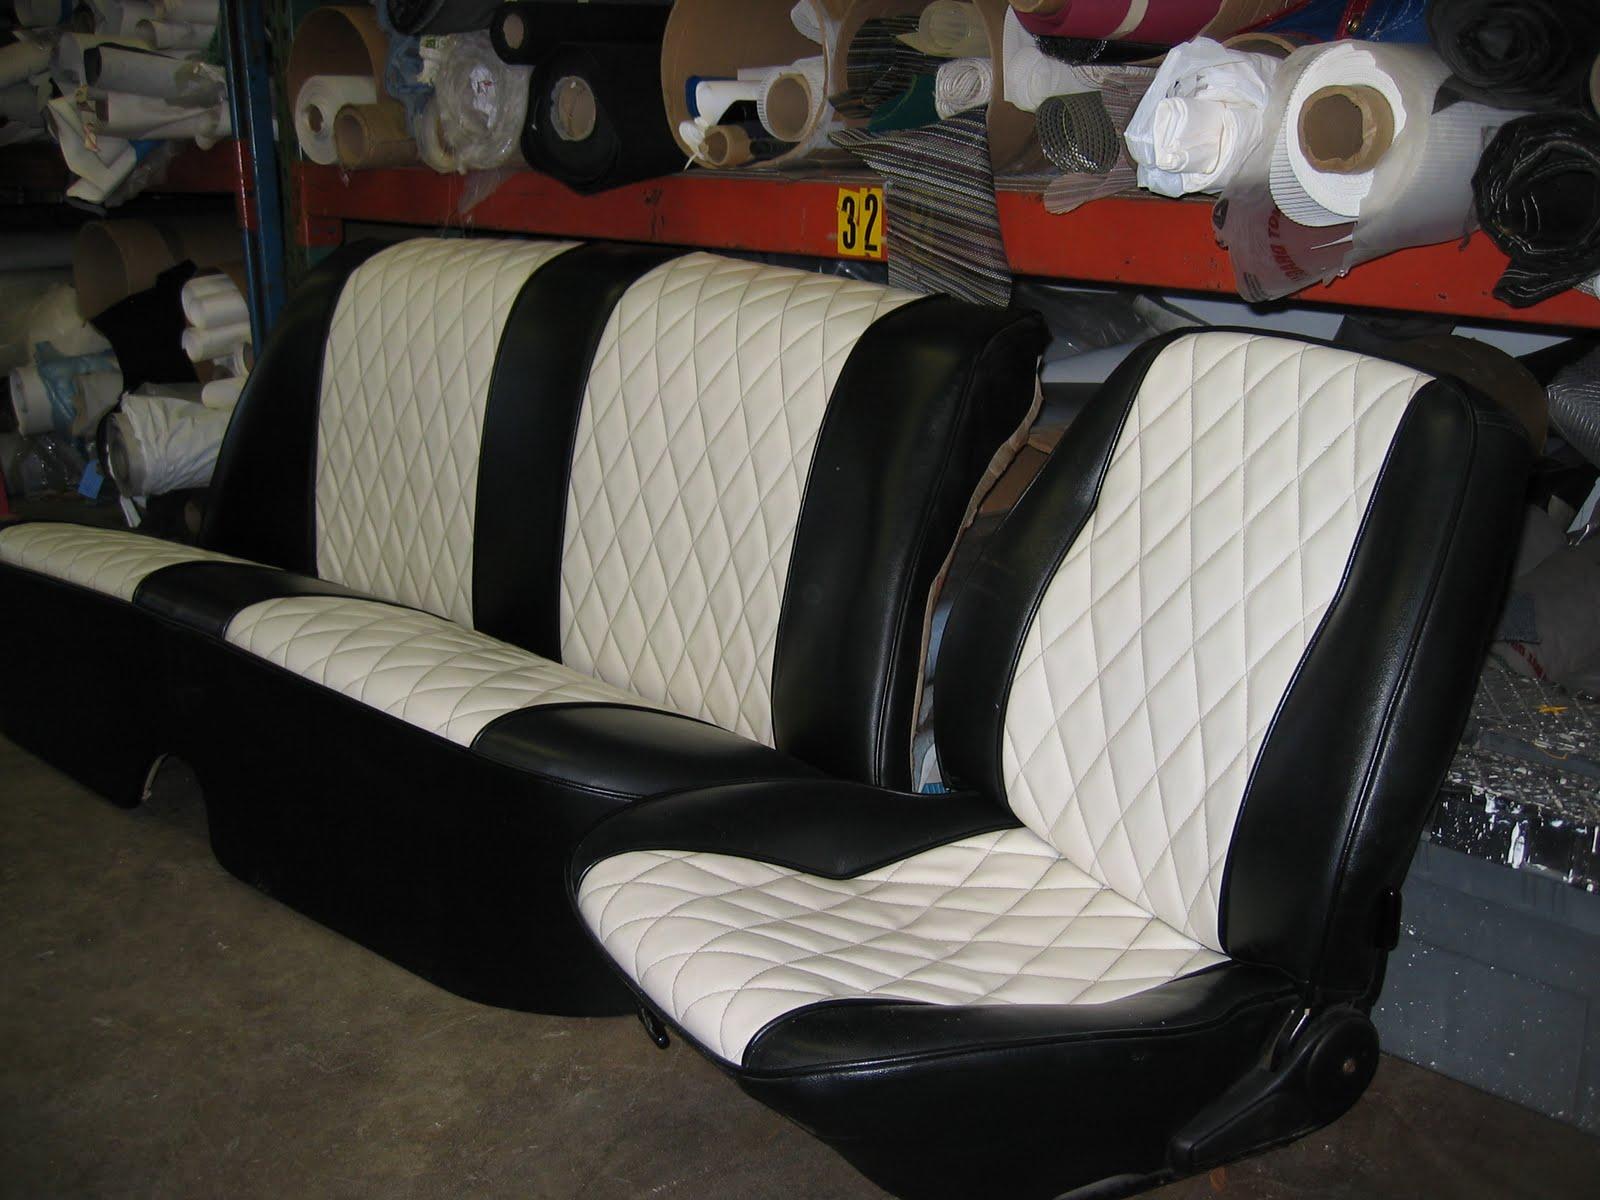 Homestyle Custom Upholstery and Awning: Custom Car Seats